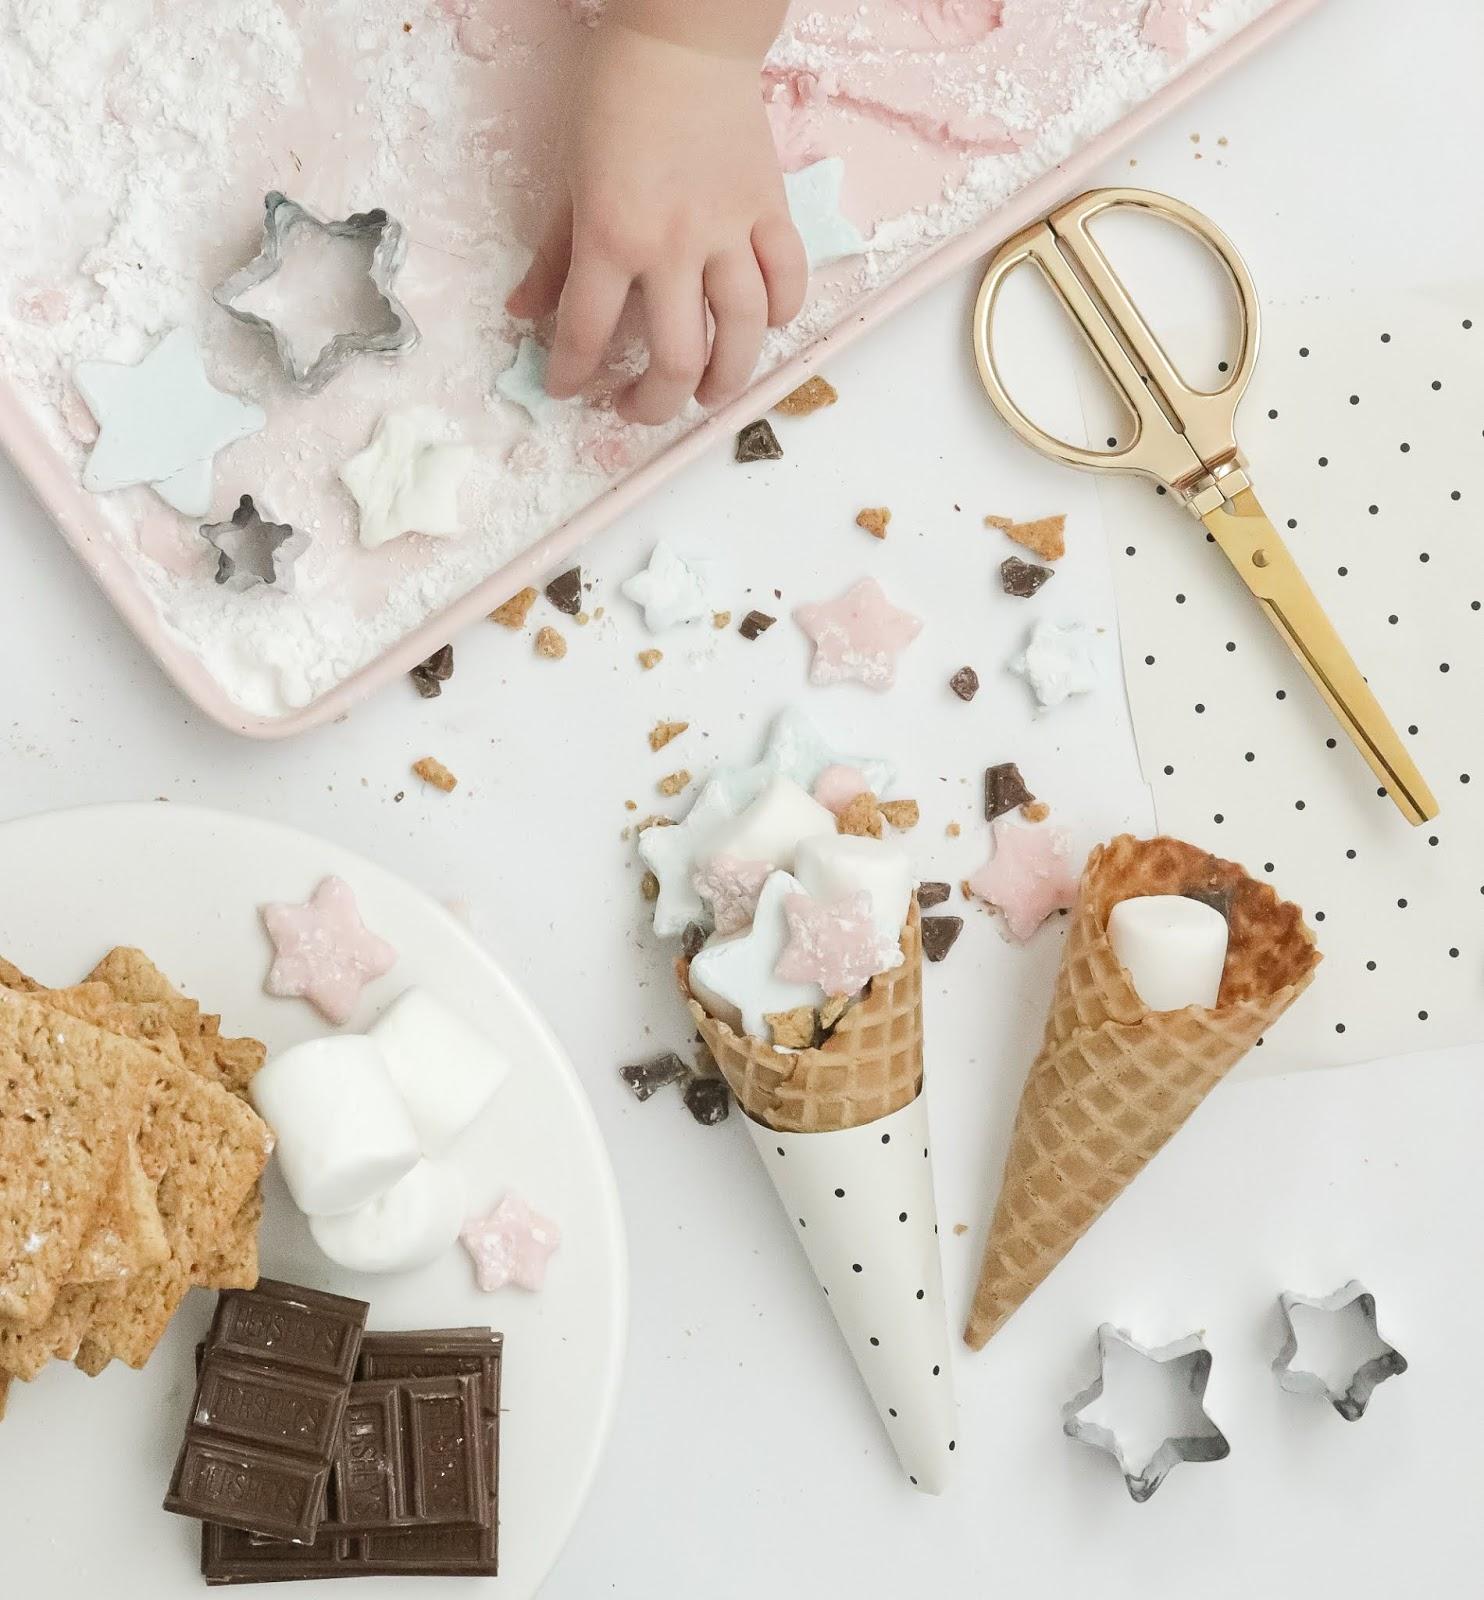 homemade marshmallows 4th of july treat